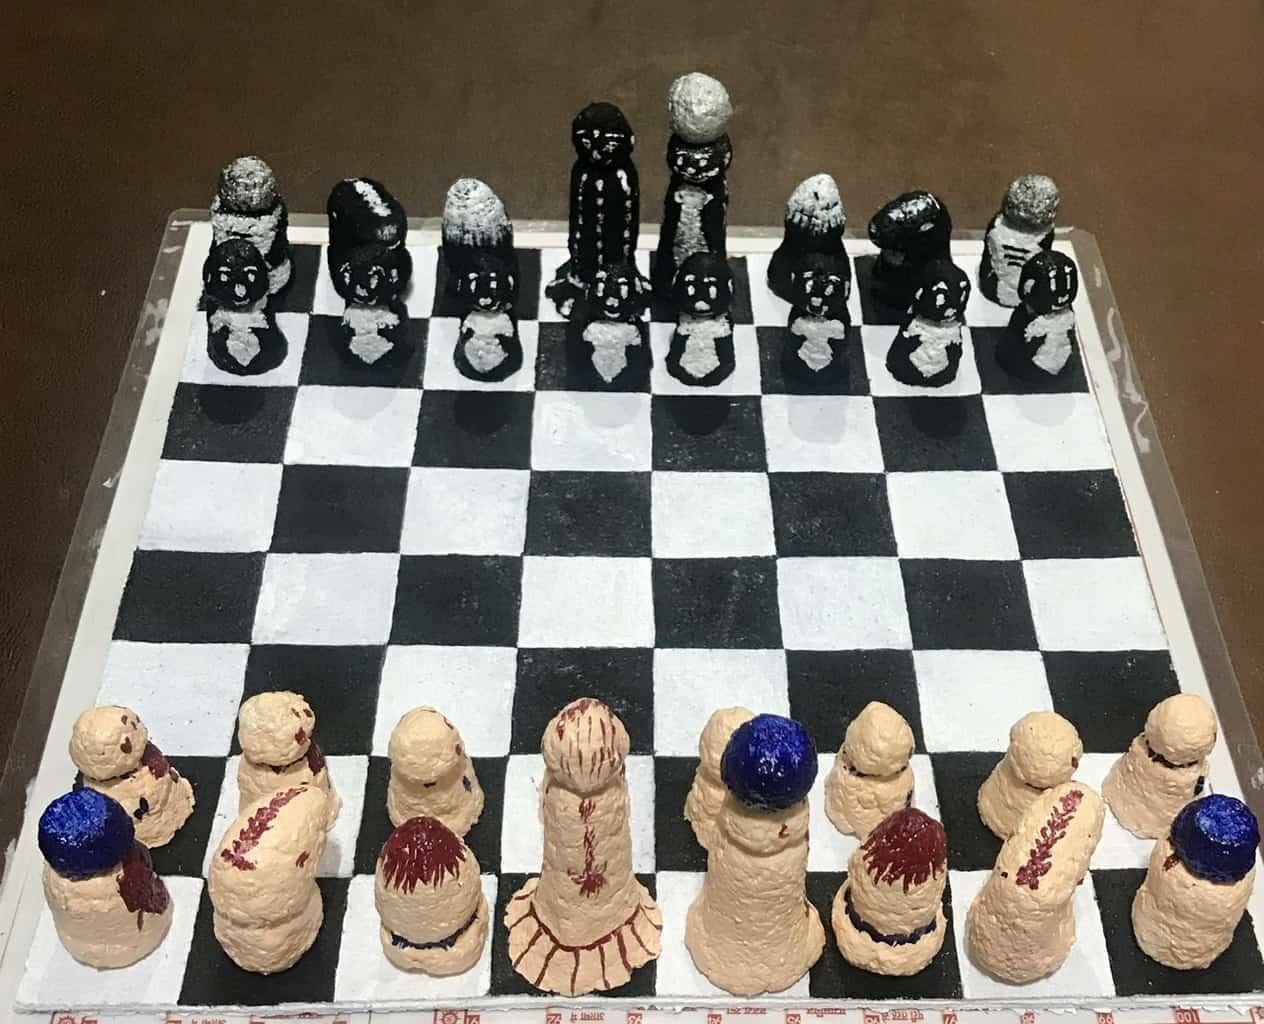 Paper Mache Chess game